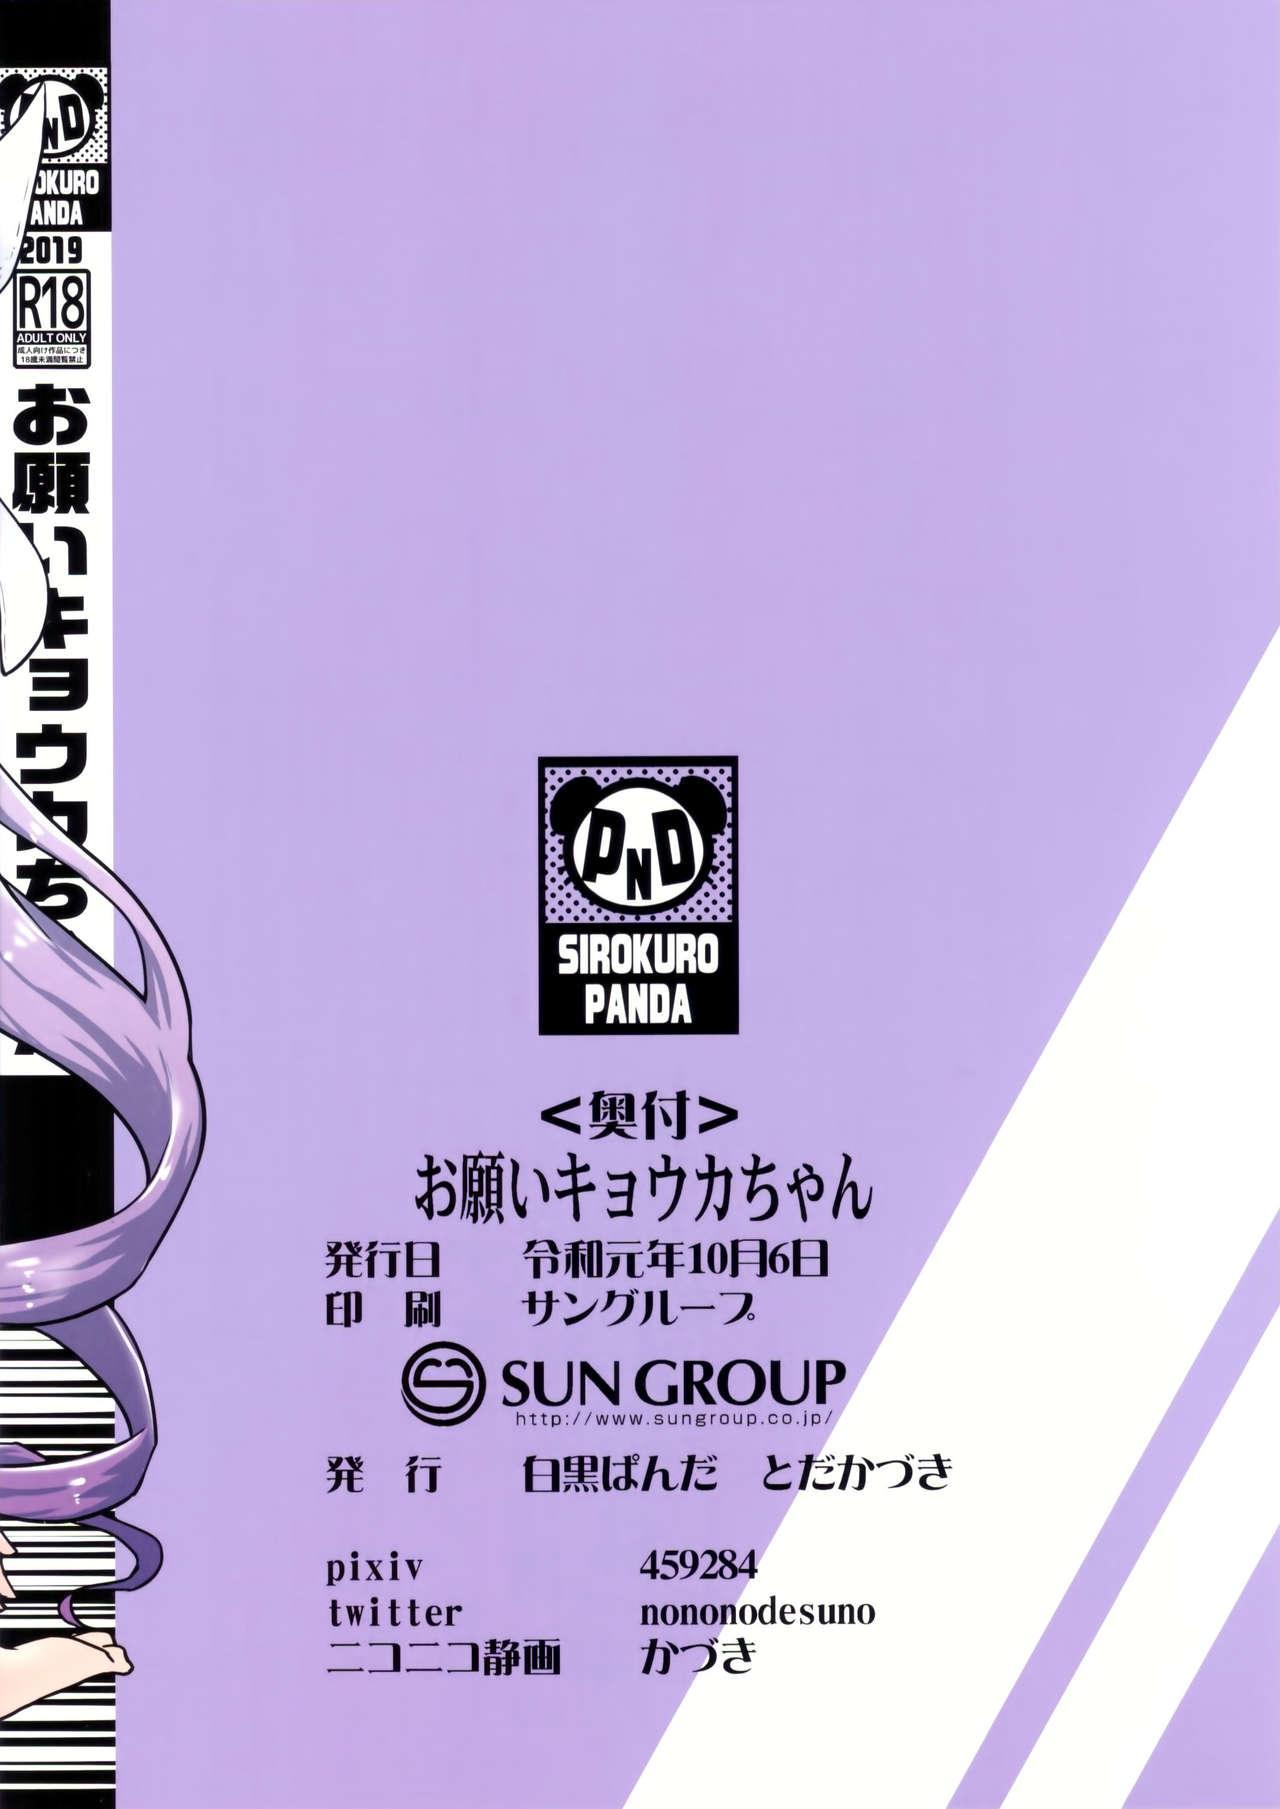 Onegai Kyouka-chan 21